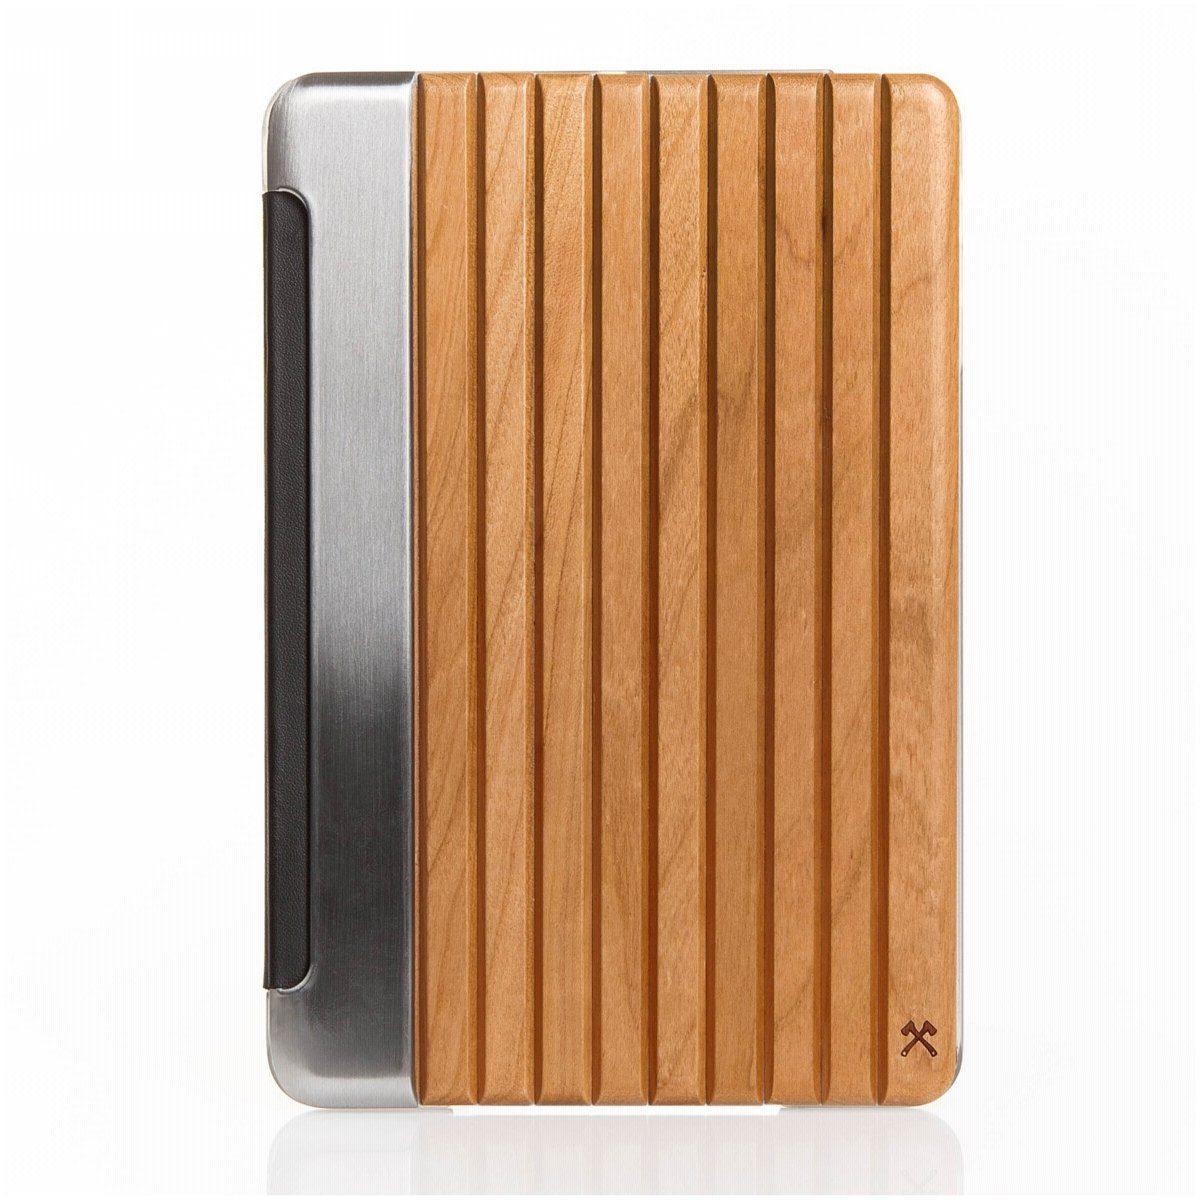 Woodcessories EcoGuard - Echtholz Case für iPad Mini 1-3